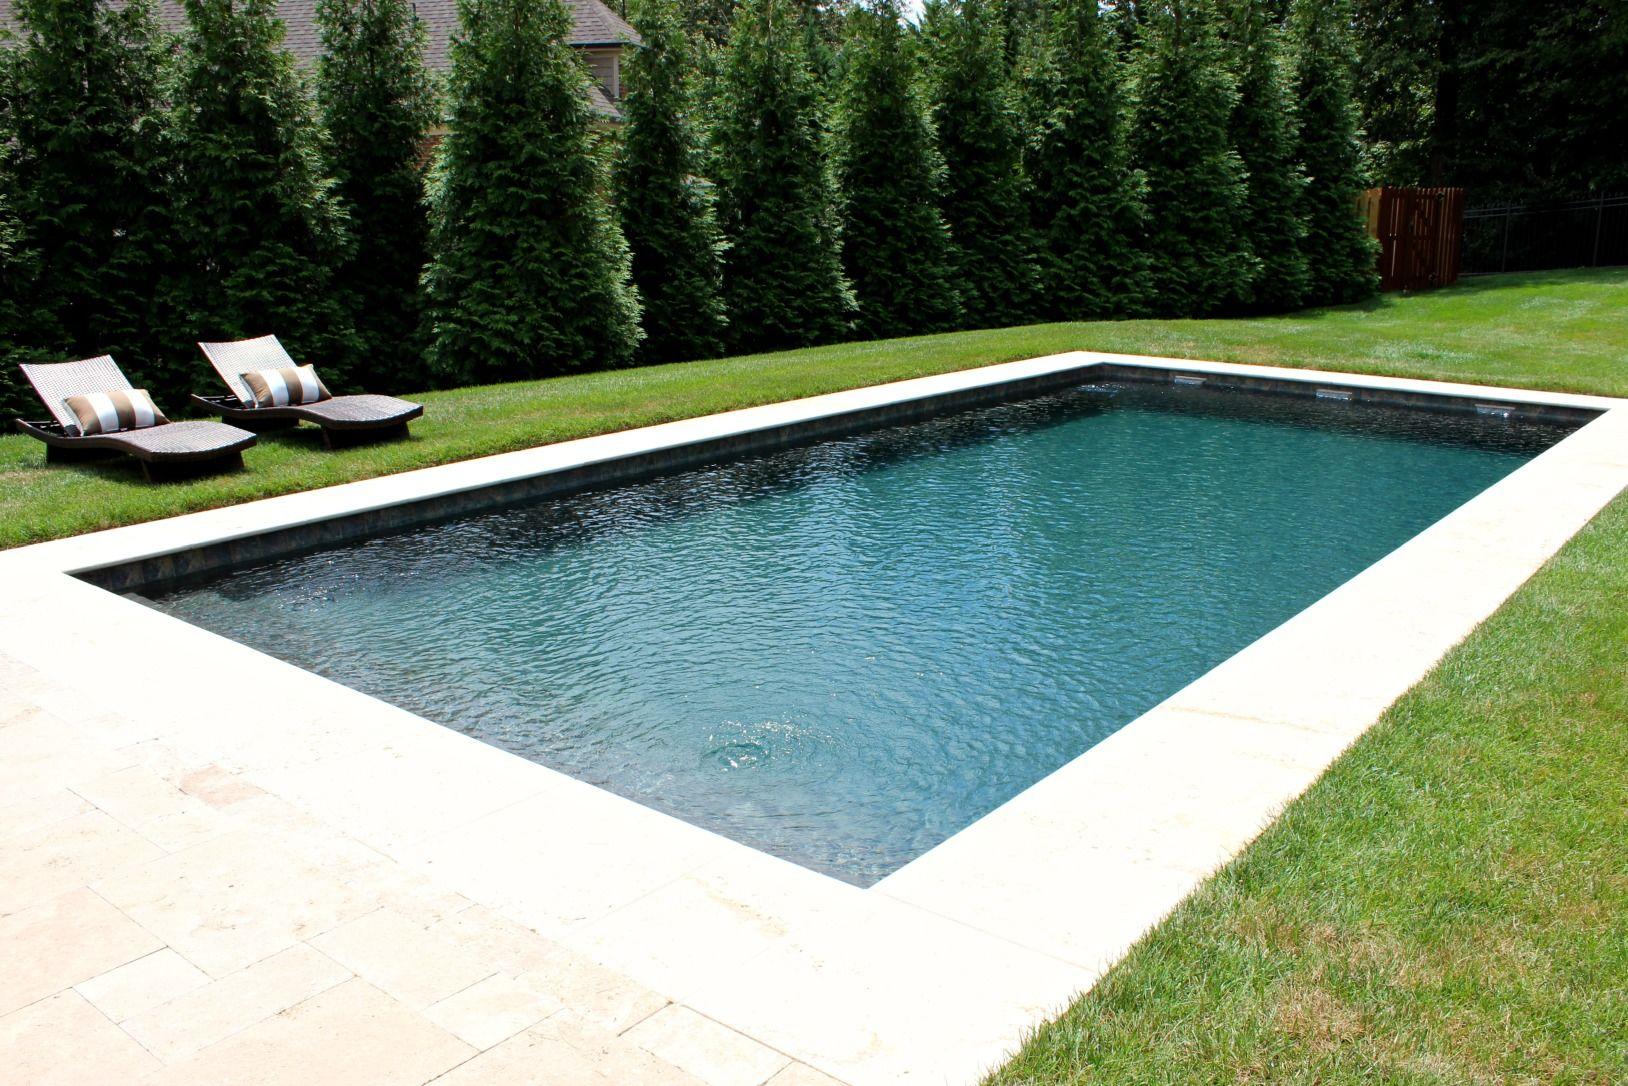 Simple Rectangular Fiberglass Pool With Sheer Descents Swimming